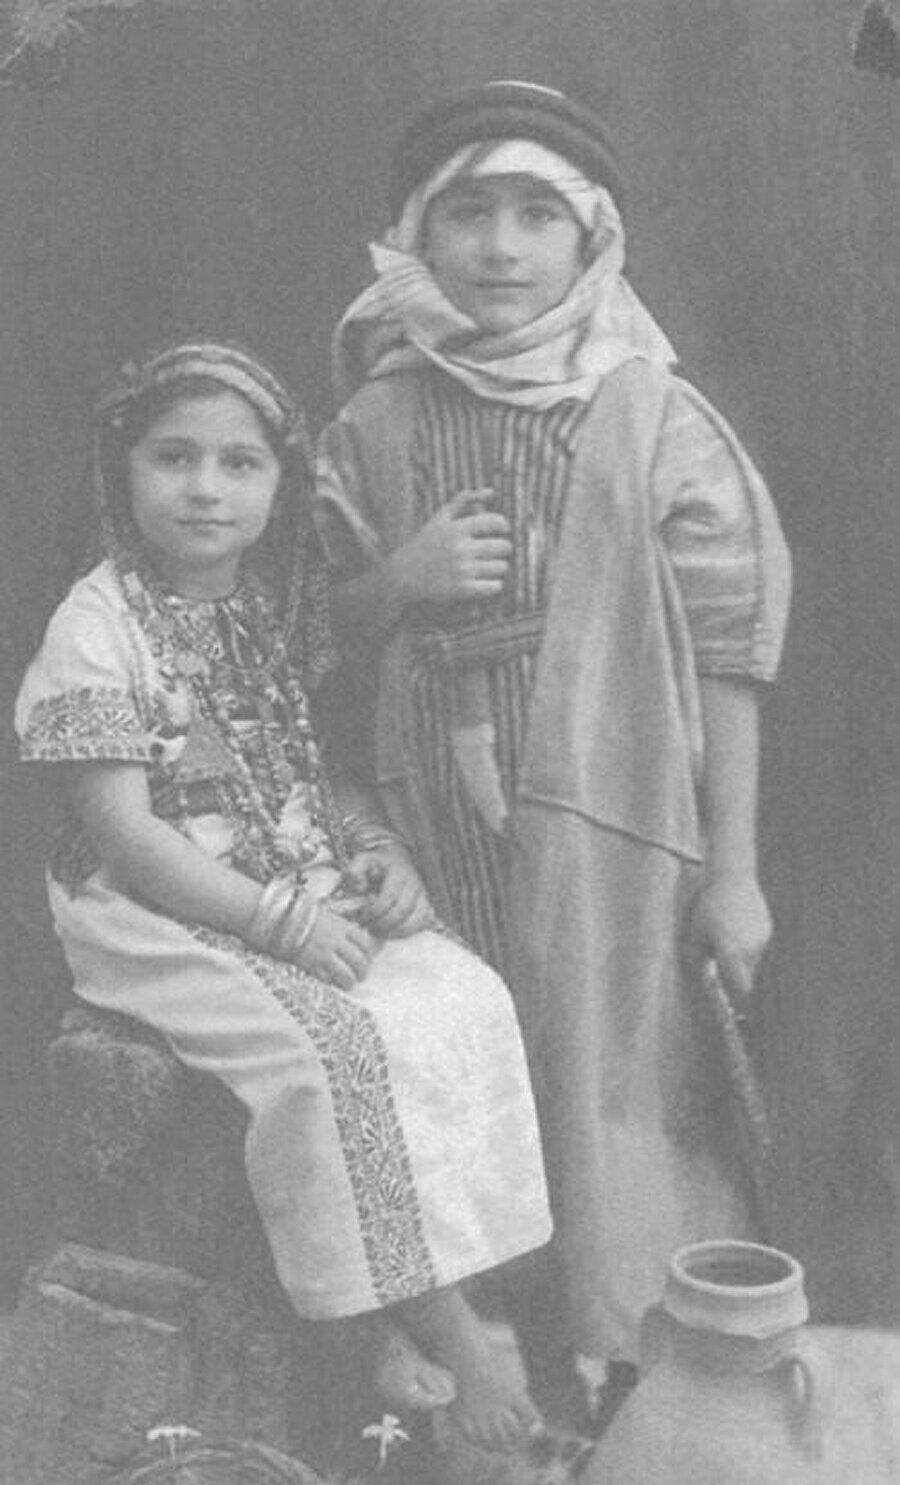 Edward Said ve kız kardeşi, Rosemarie Said. (1940)